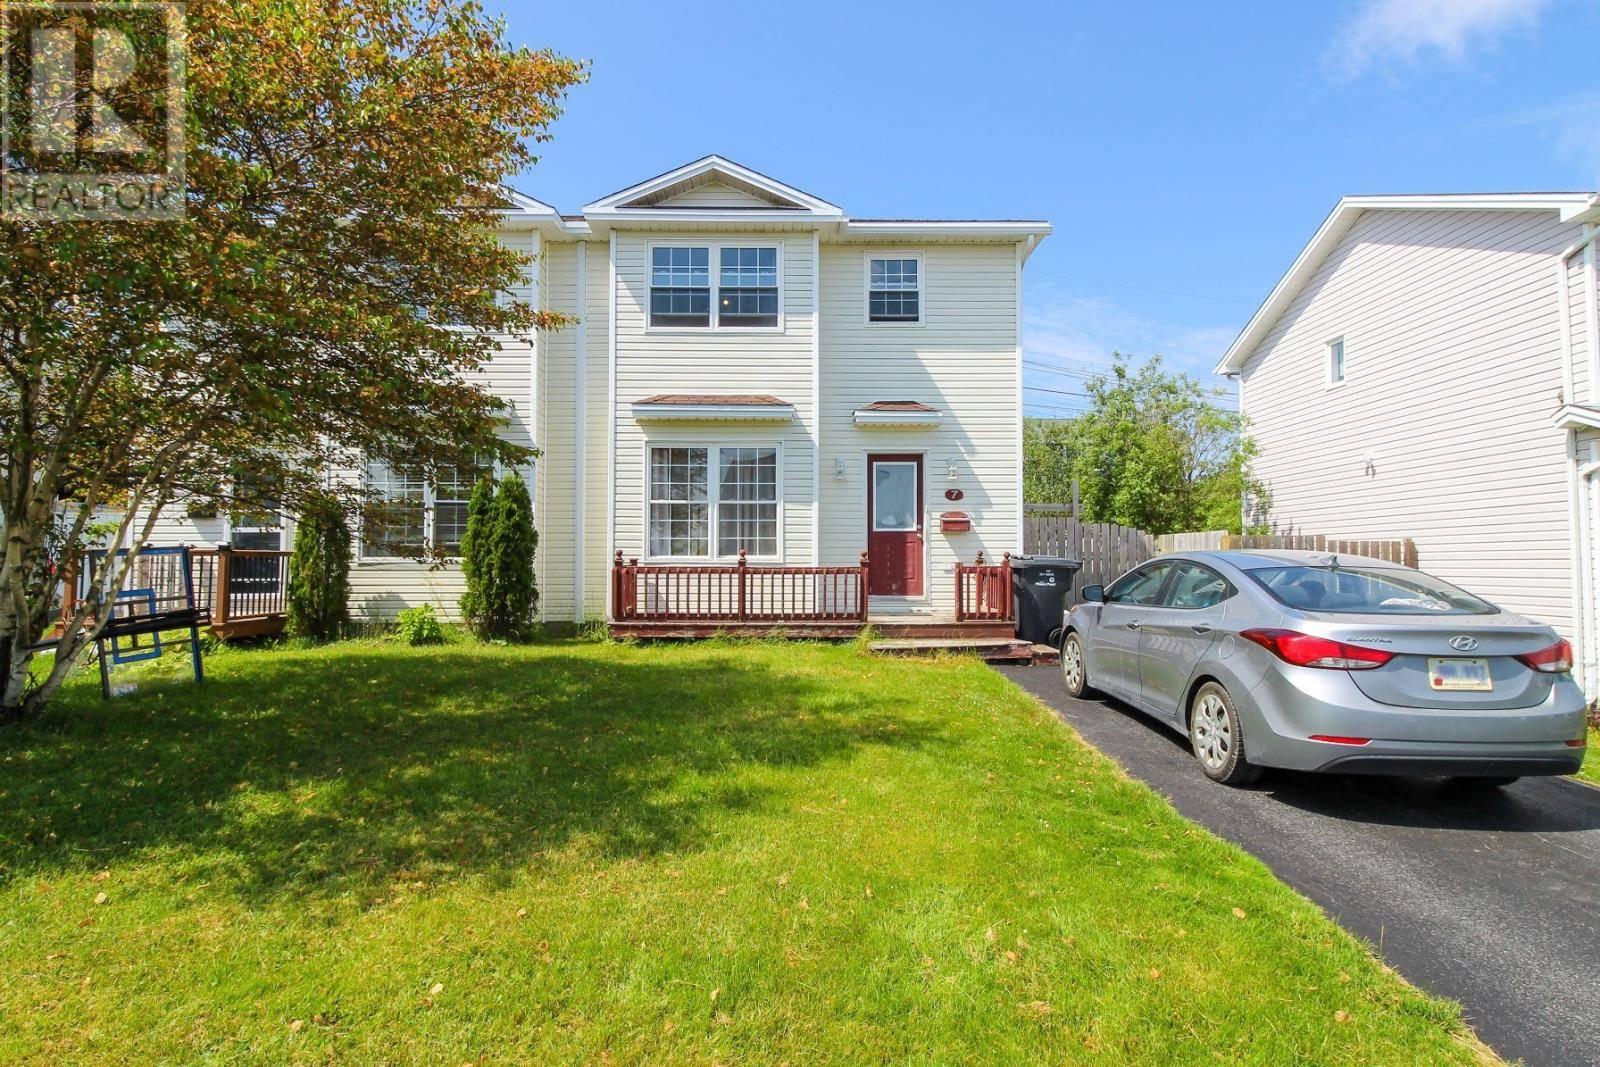 House for sale at 7 Laumann Pl Mount Pearl Newfoundland - MLS: 1200278